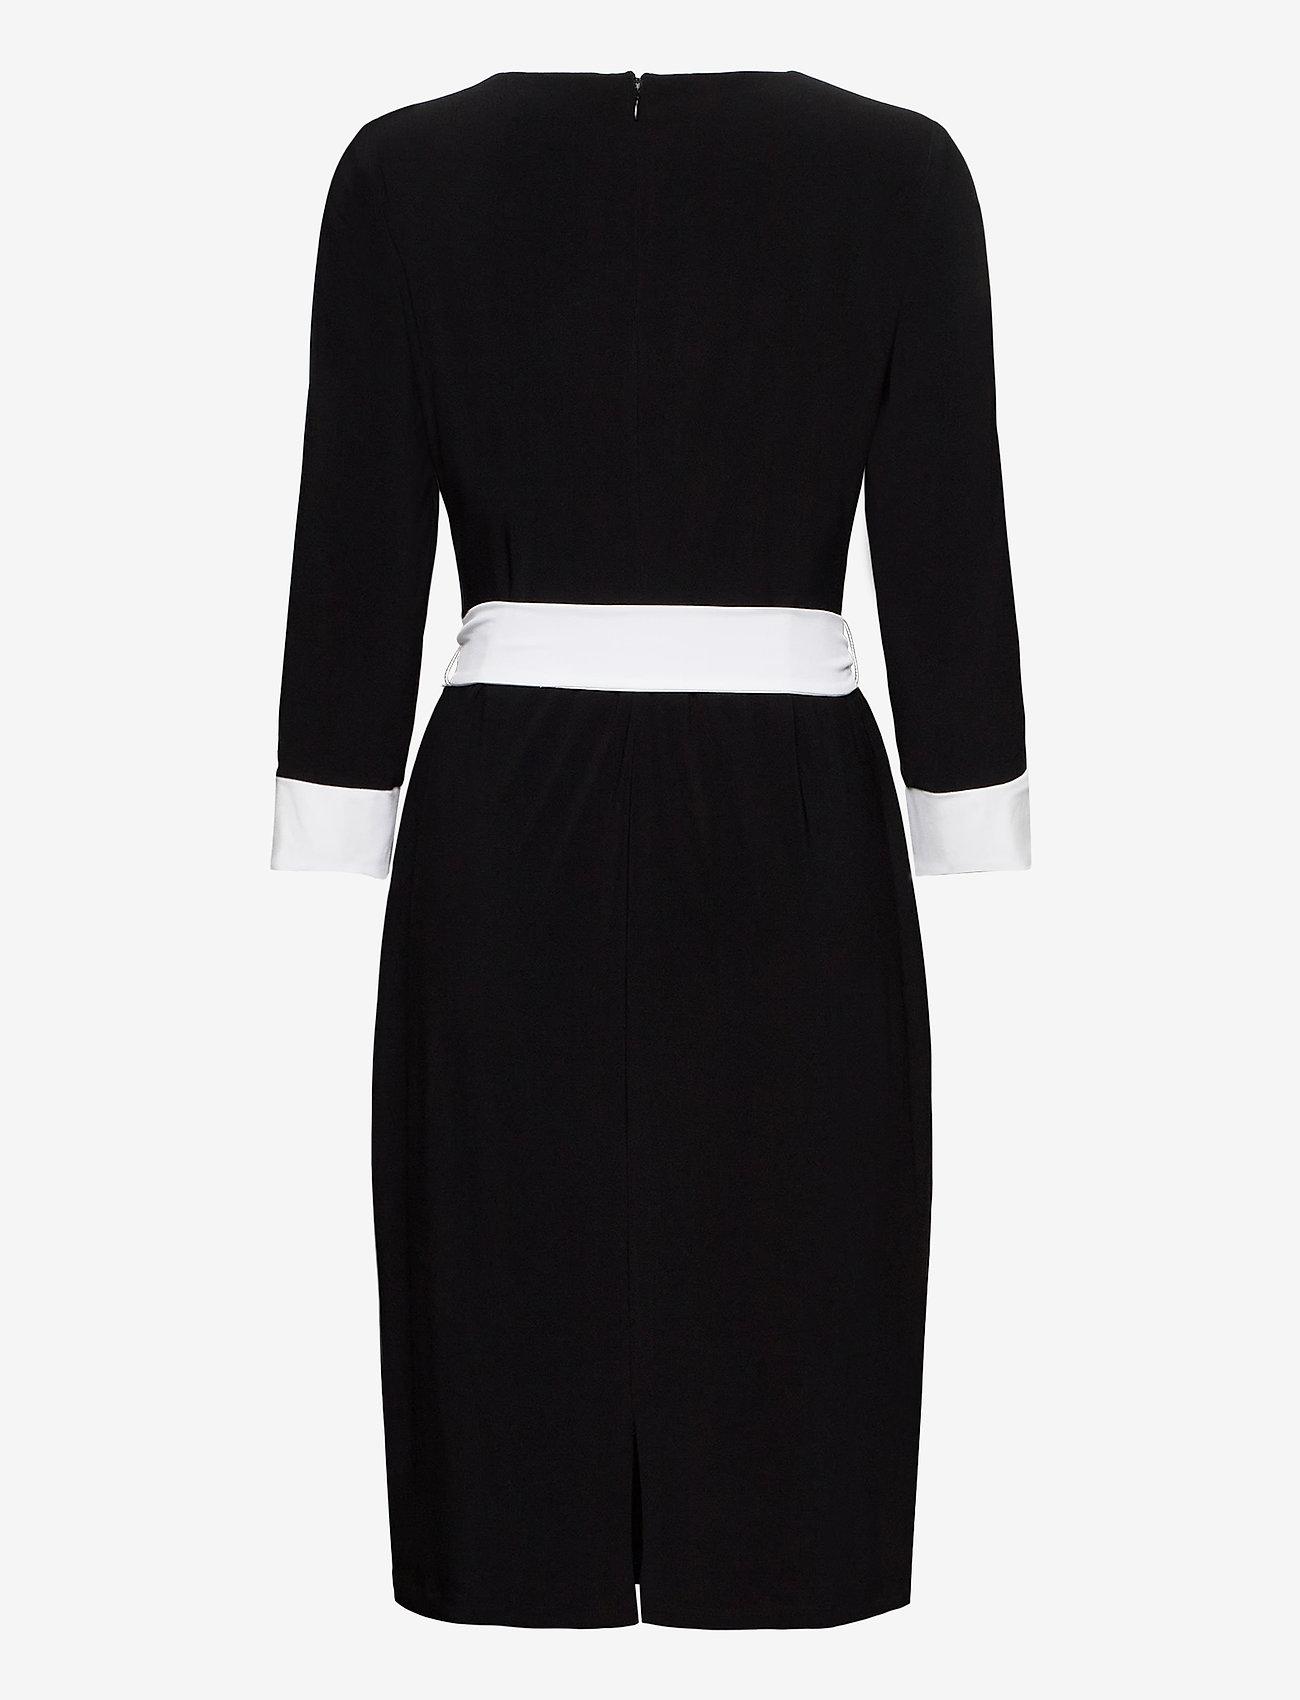 Classic Mj-2-tone Dress (Black/lauren Whit) - Lauren Ralph Lauren 2tgJyx